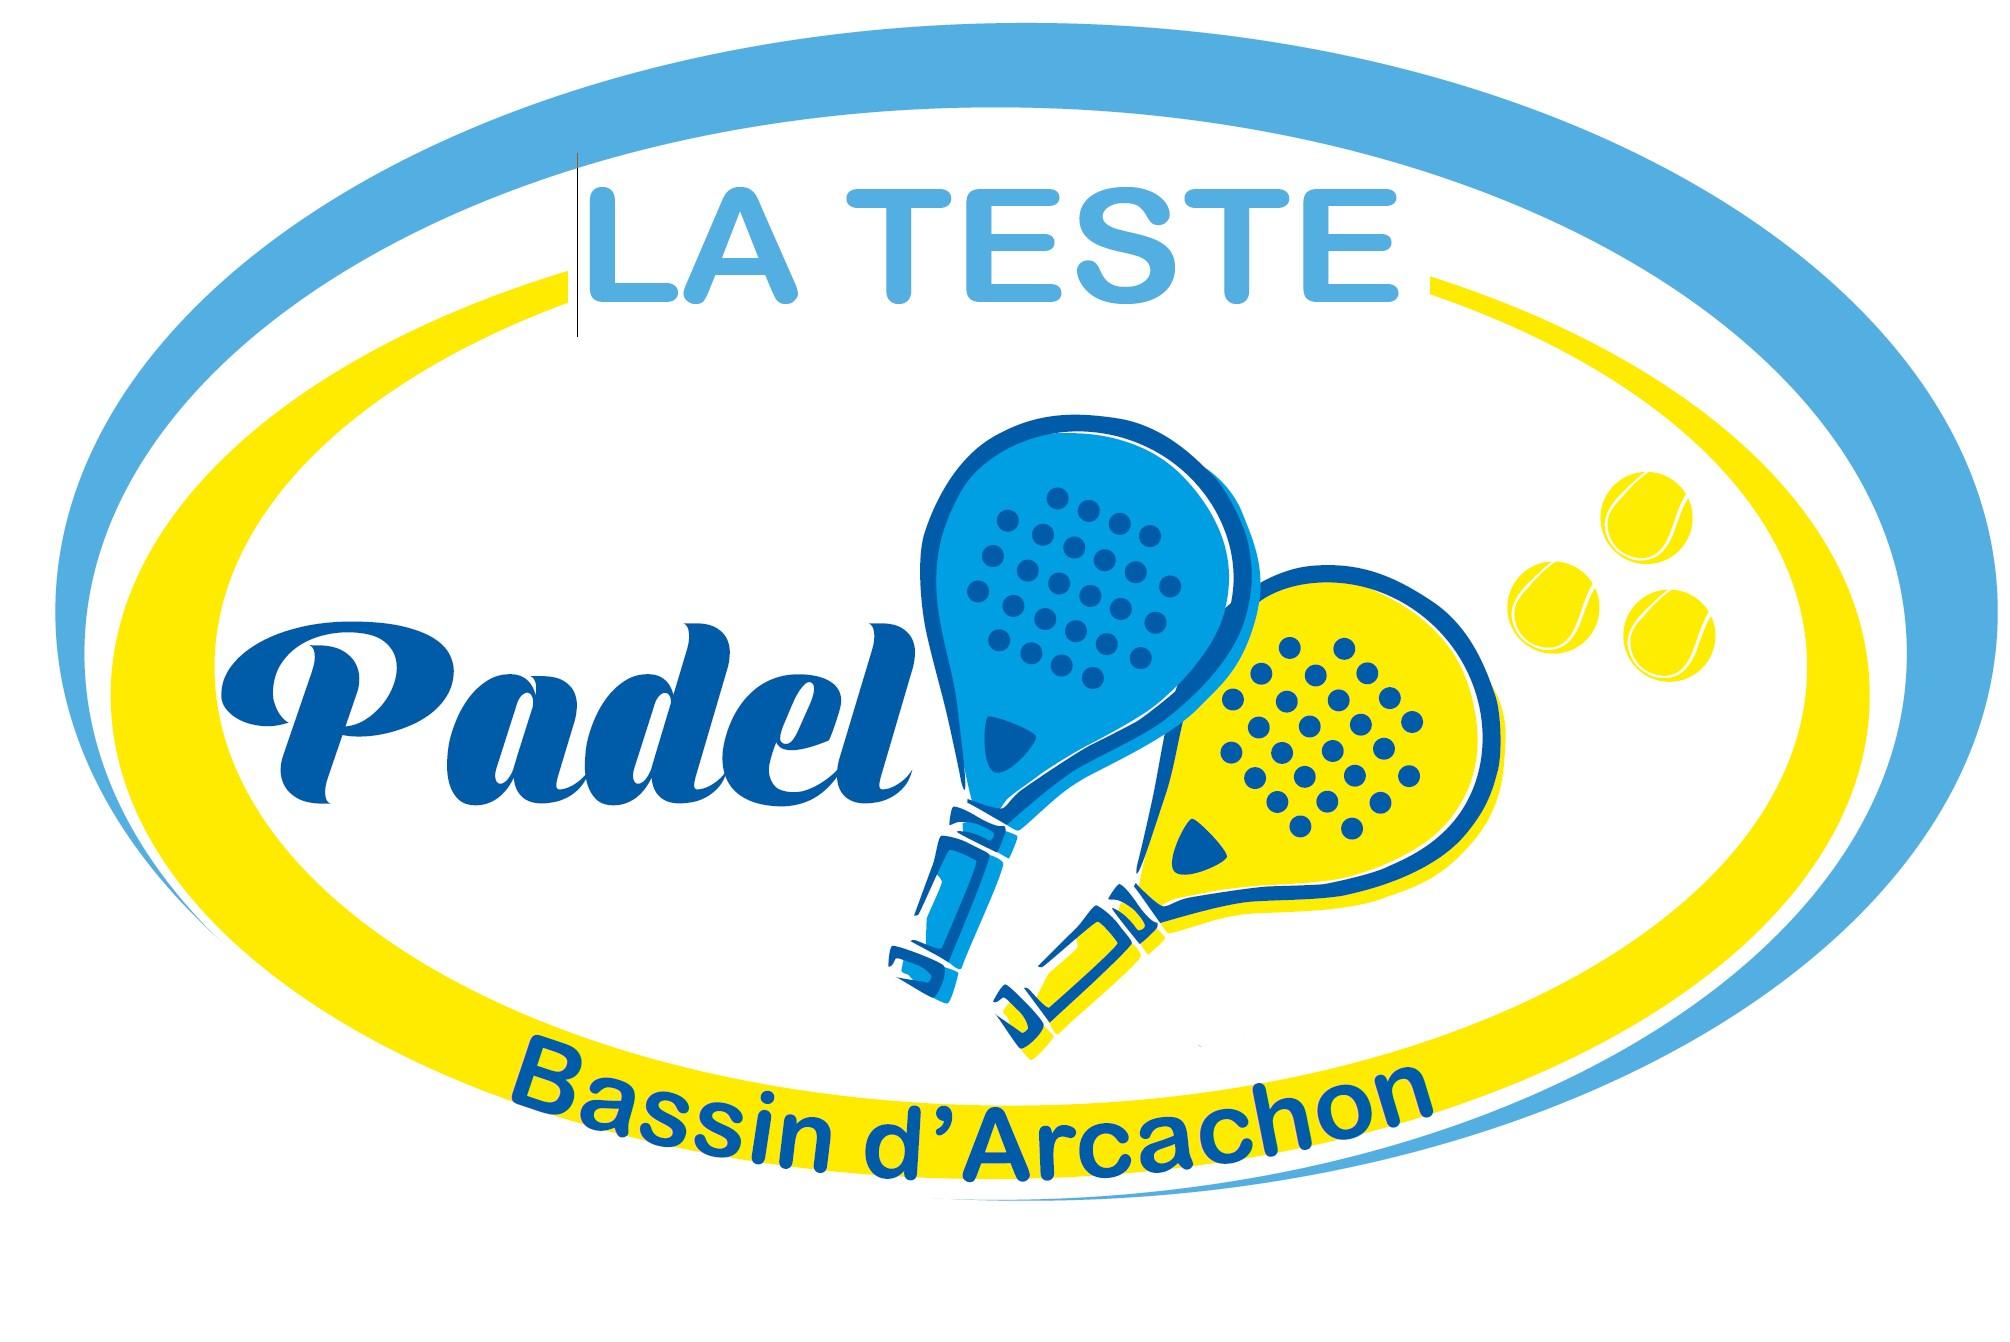 logo padel tennis club teste arcachon